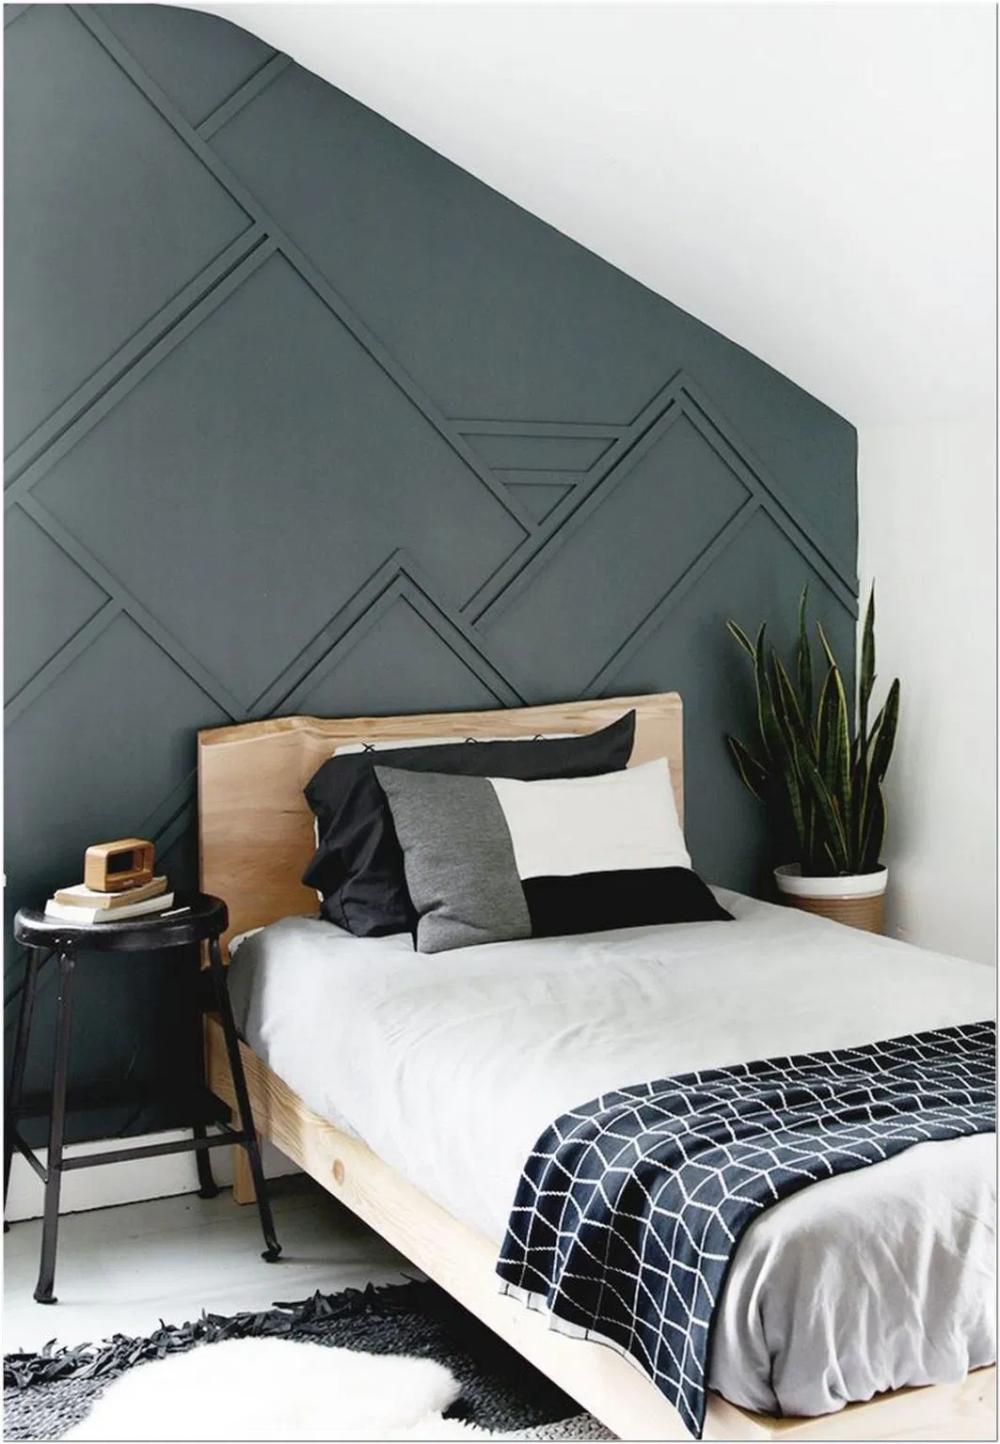 91 Cozy Bedding Refresh 15 Accent Wall Bedroom Wall Decor Bedroom Bedroom Wall